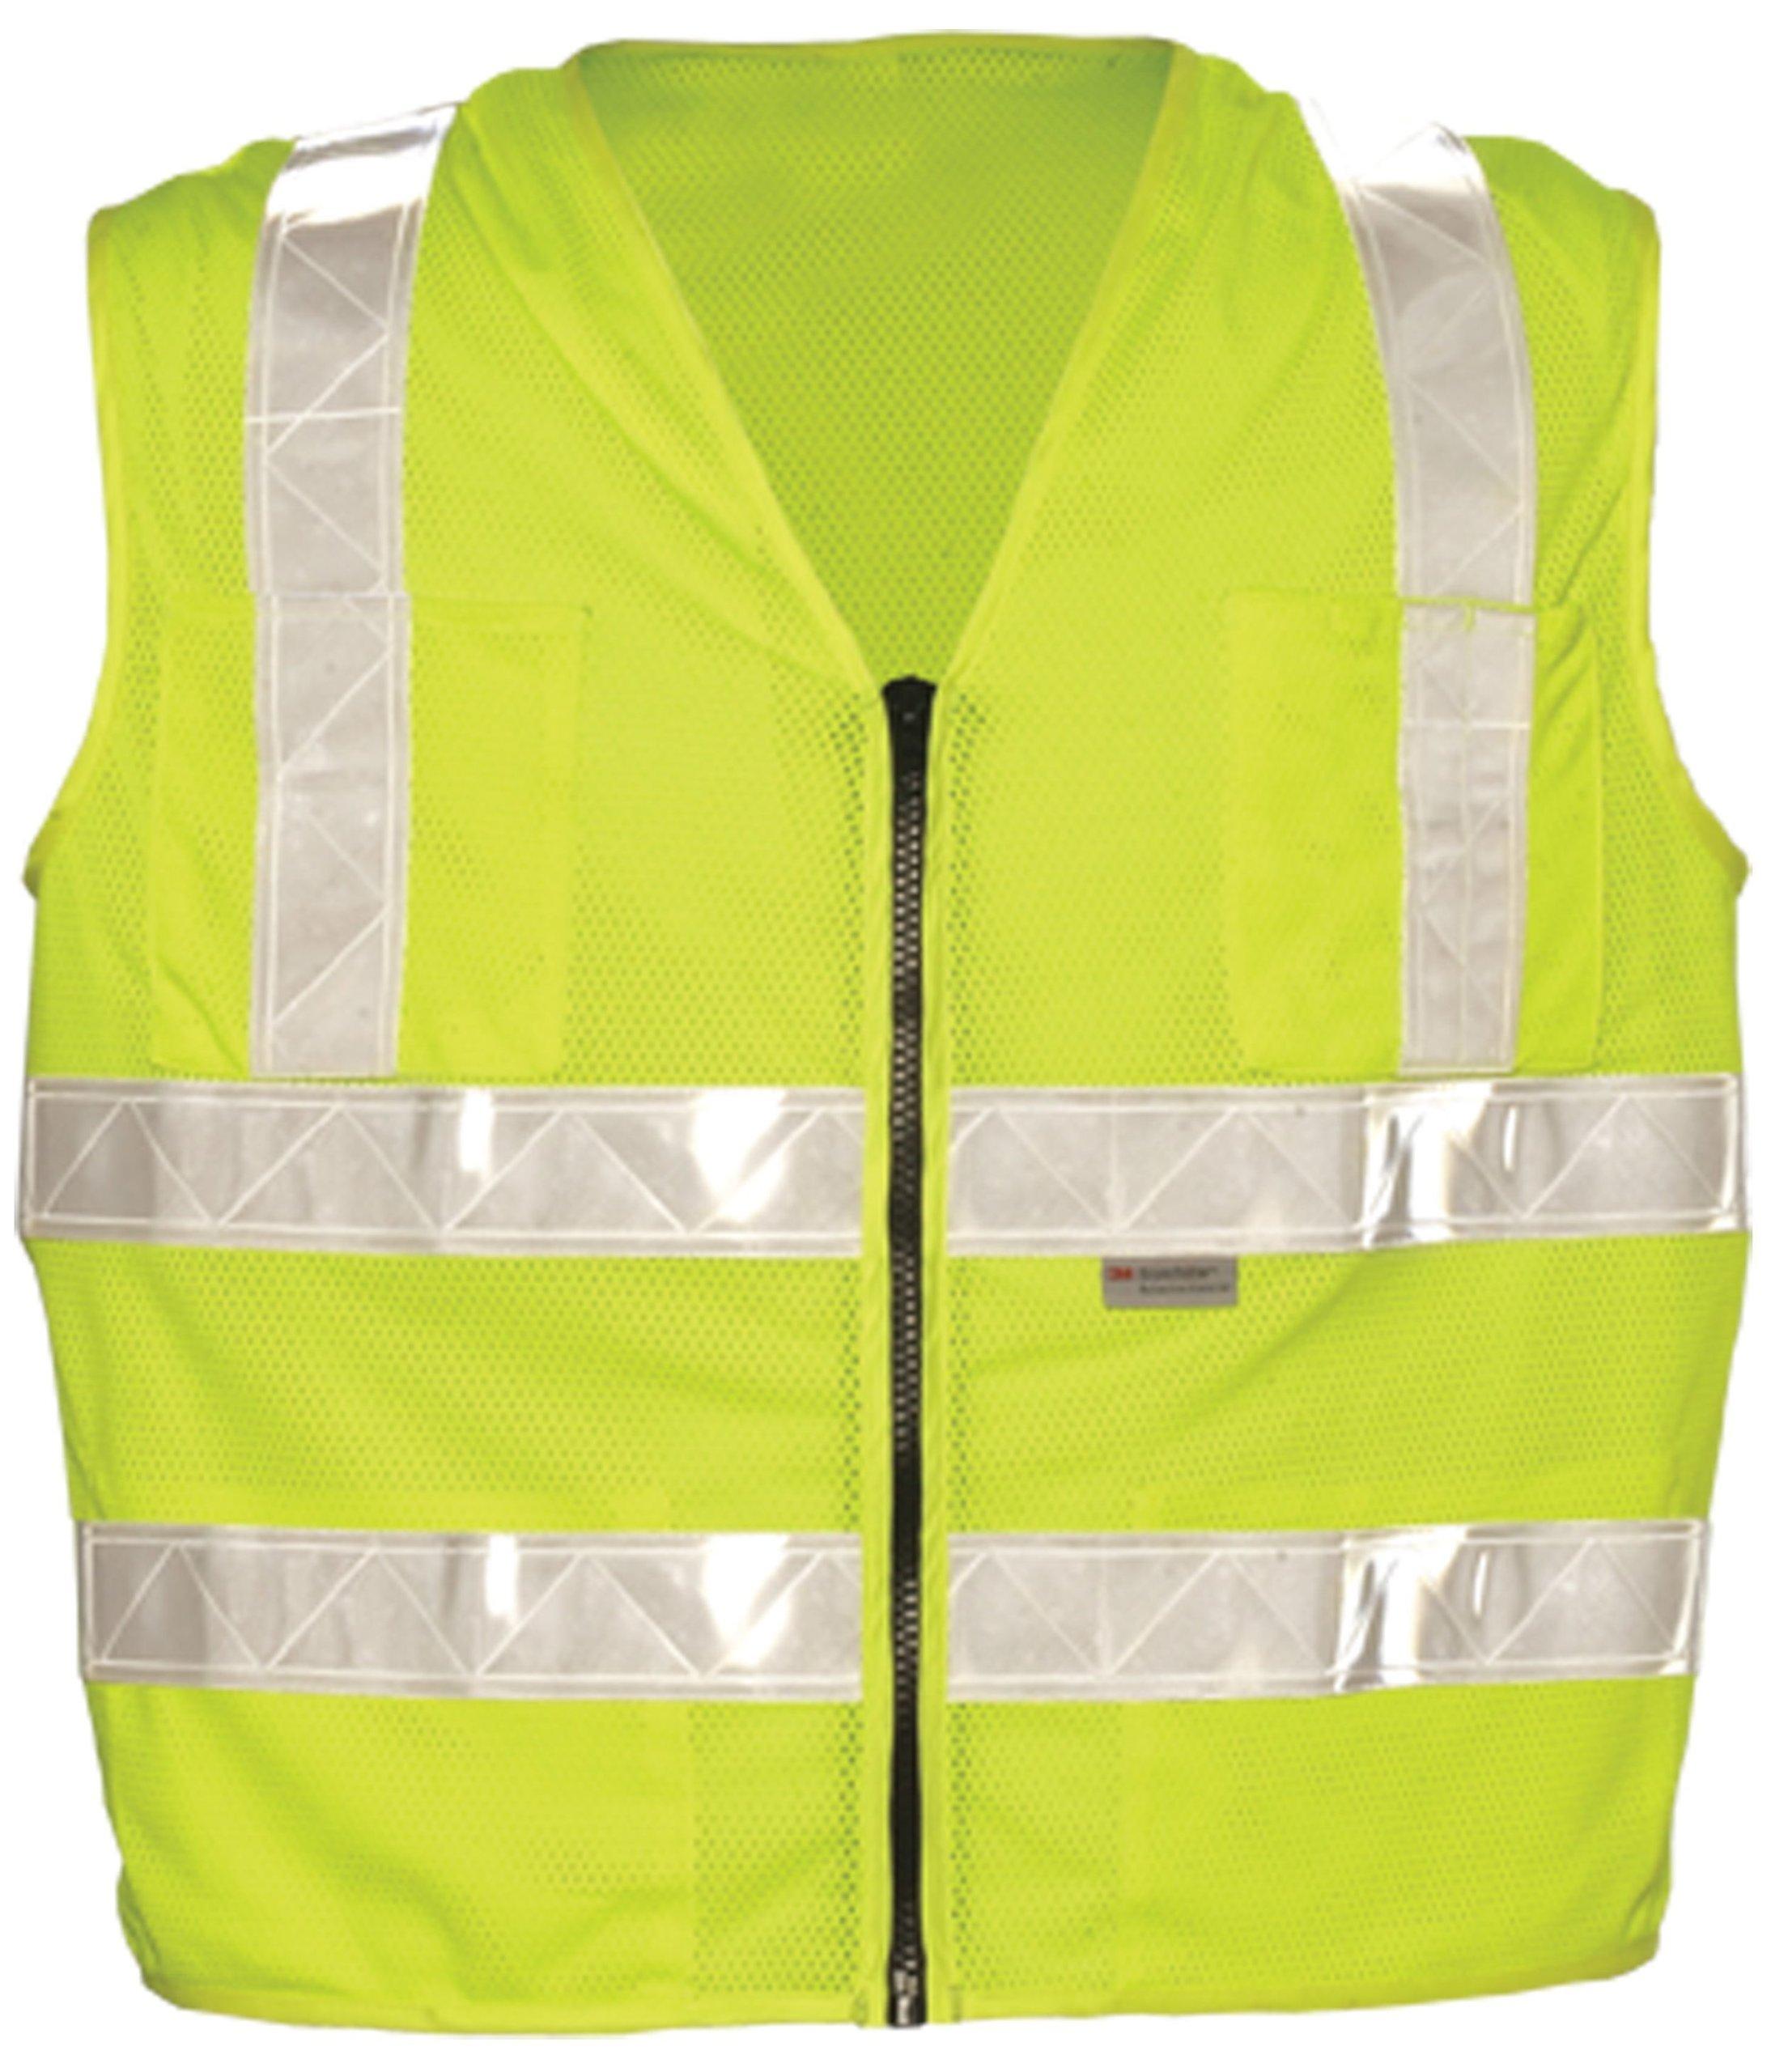 OK-1 00314 Zipper Style Lime Vest - White Trim, 2X-Large